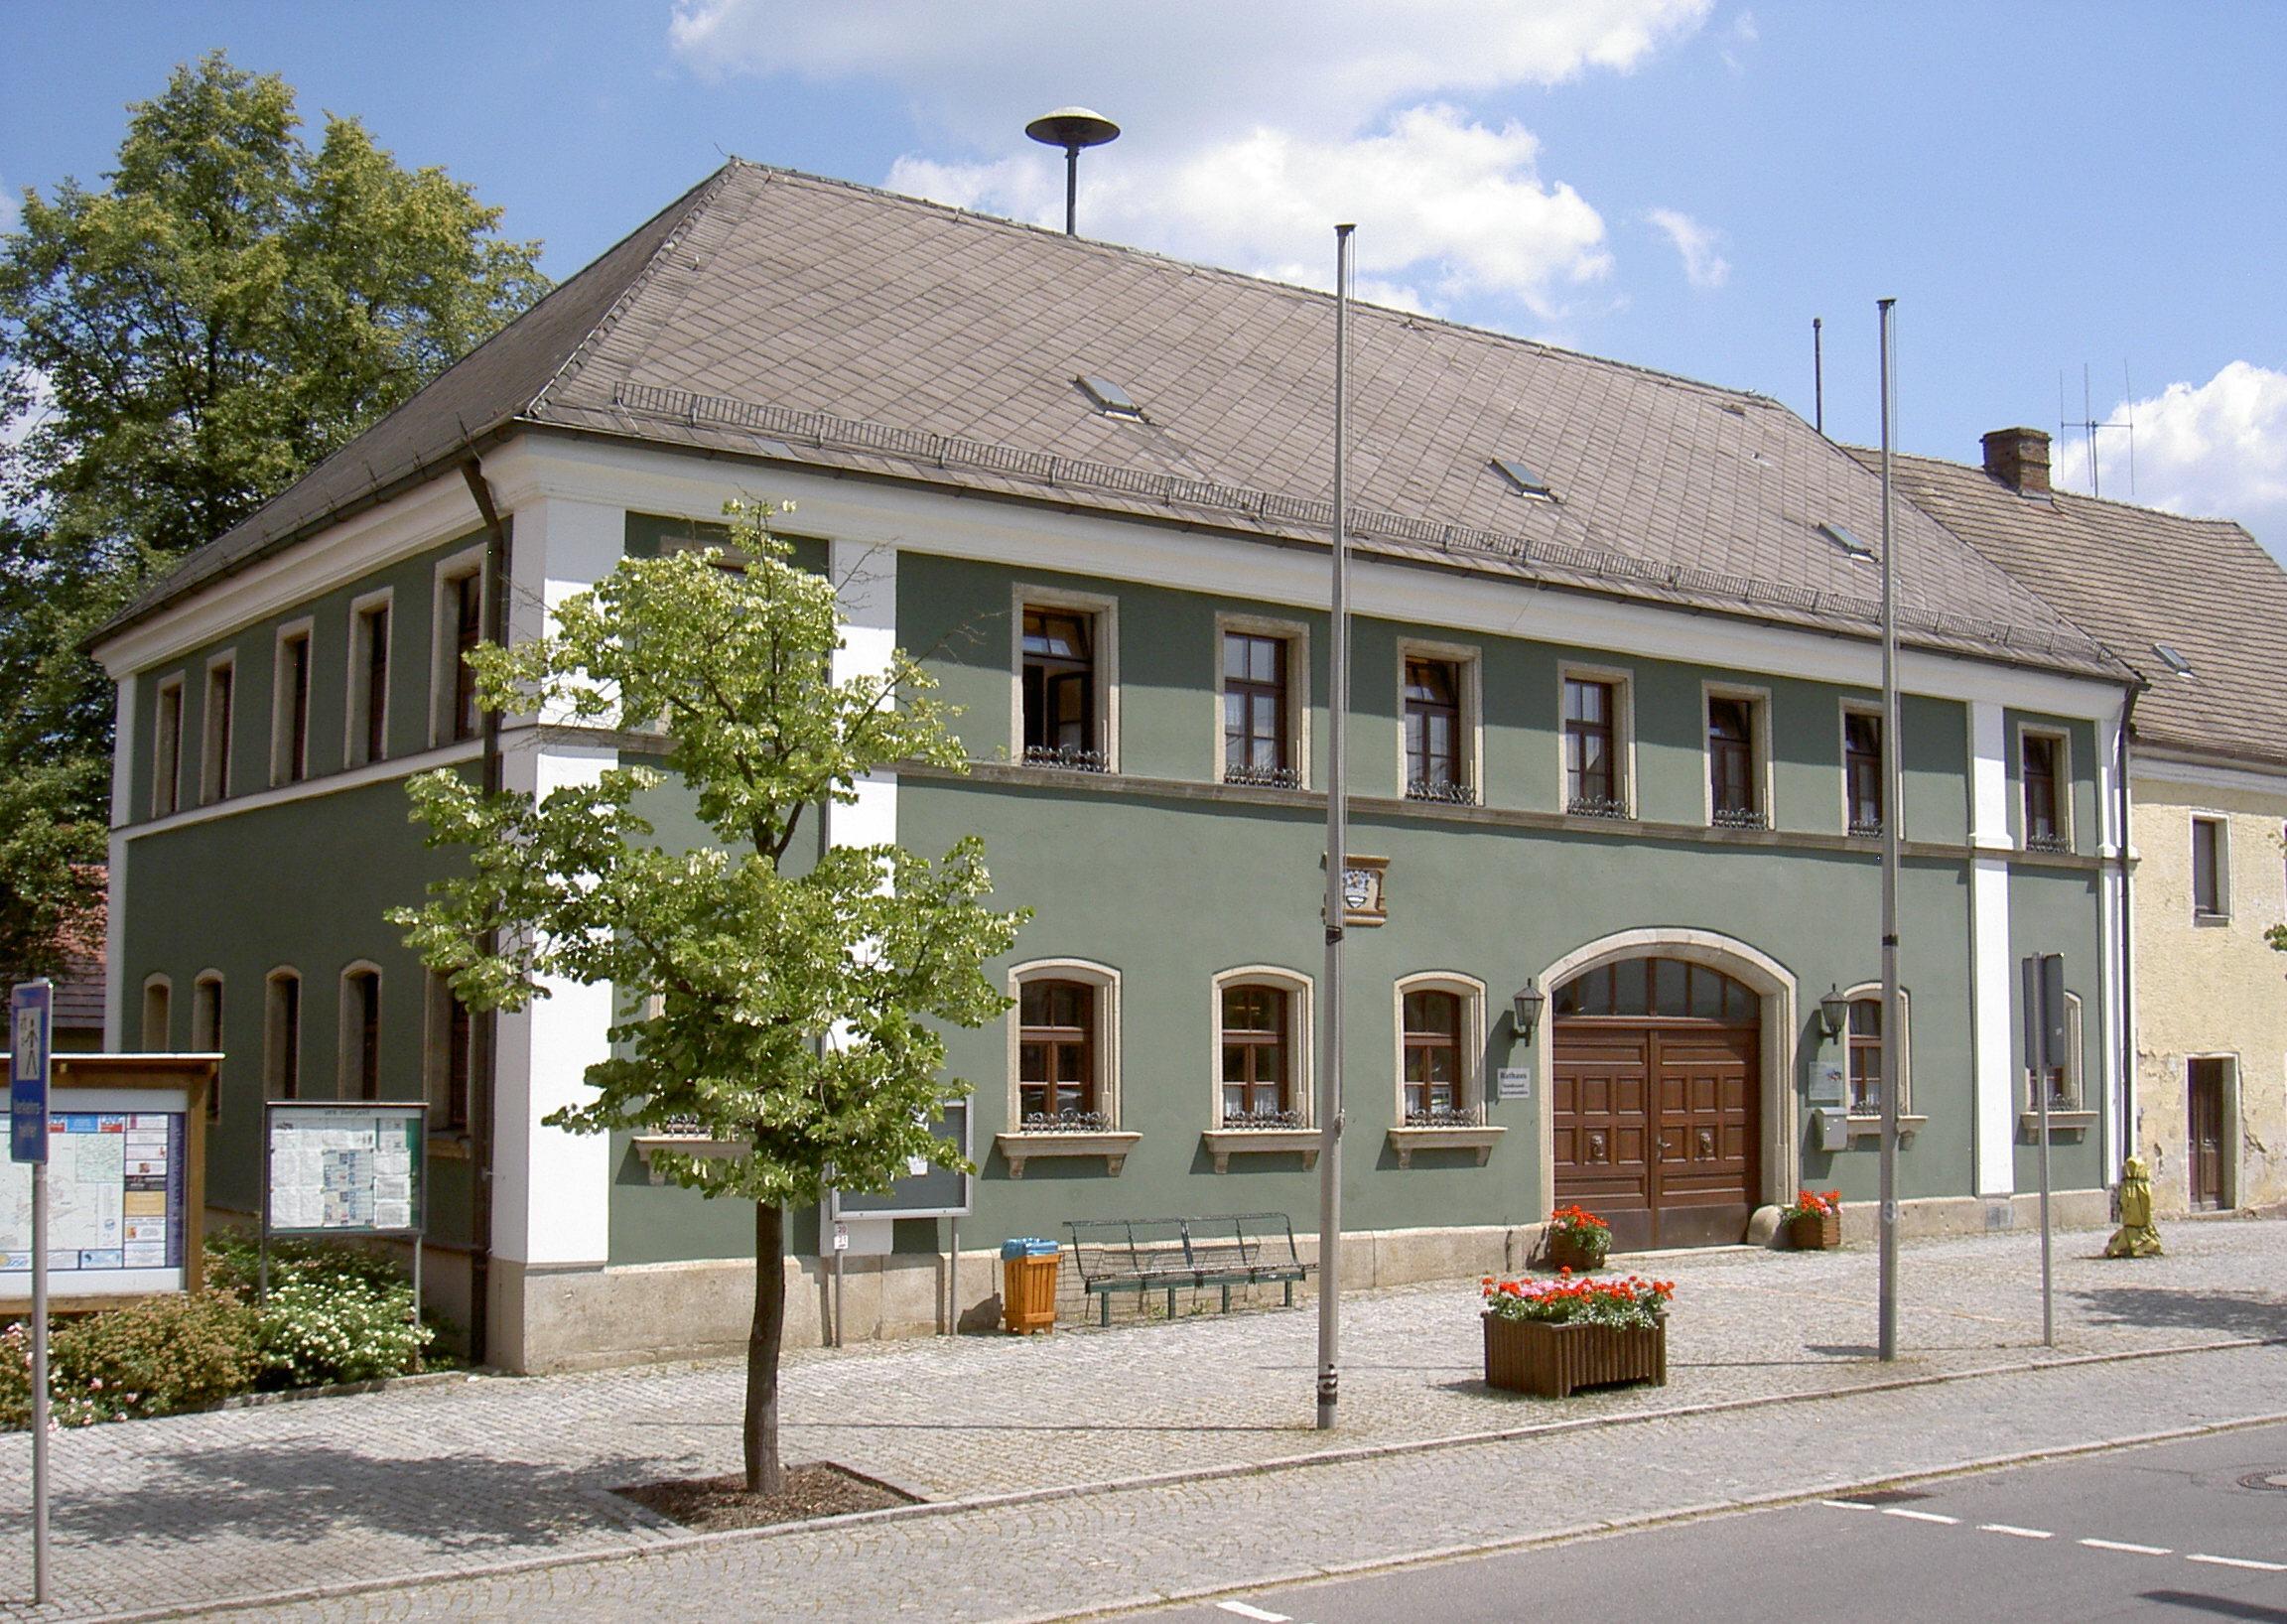 Eslarner Rathaus